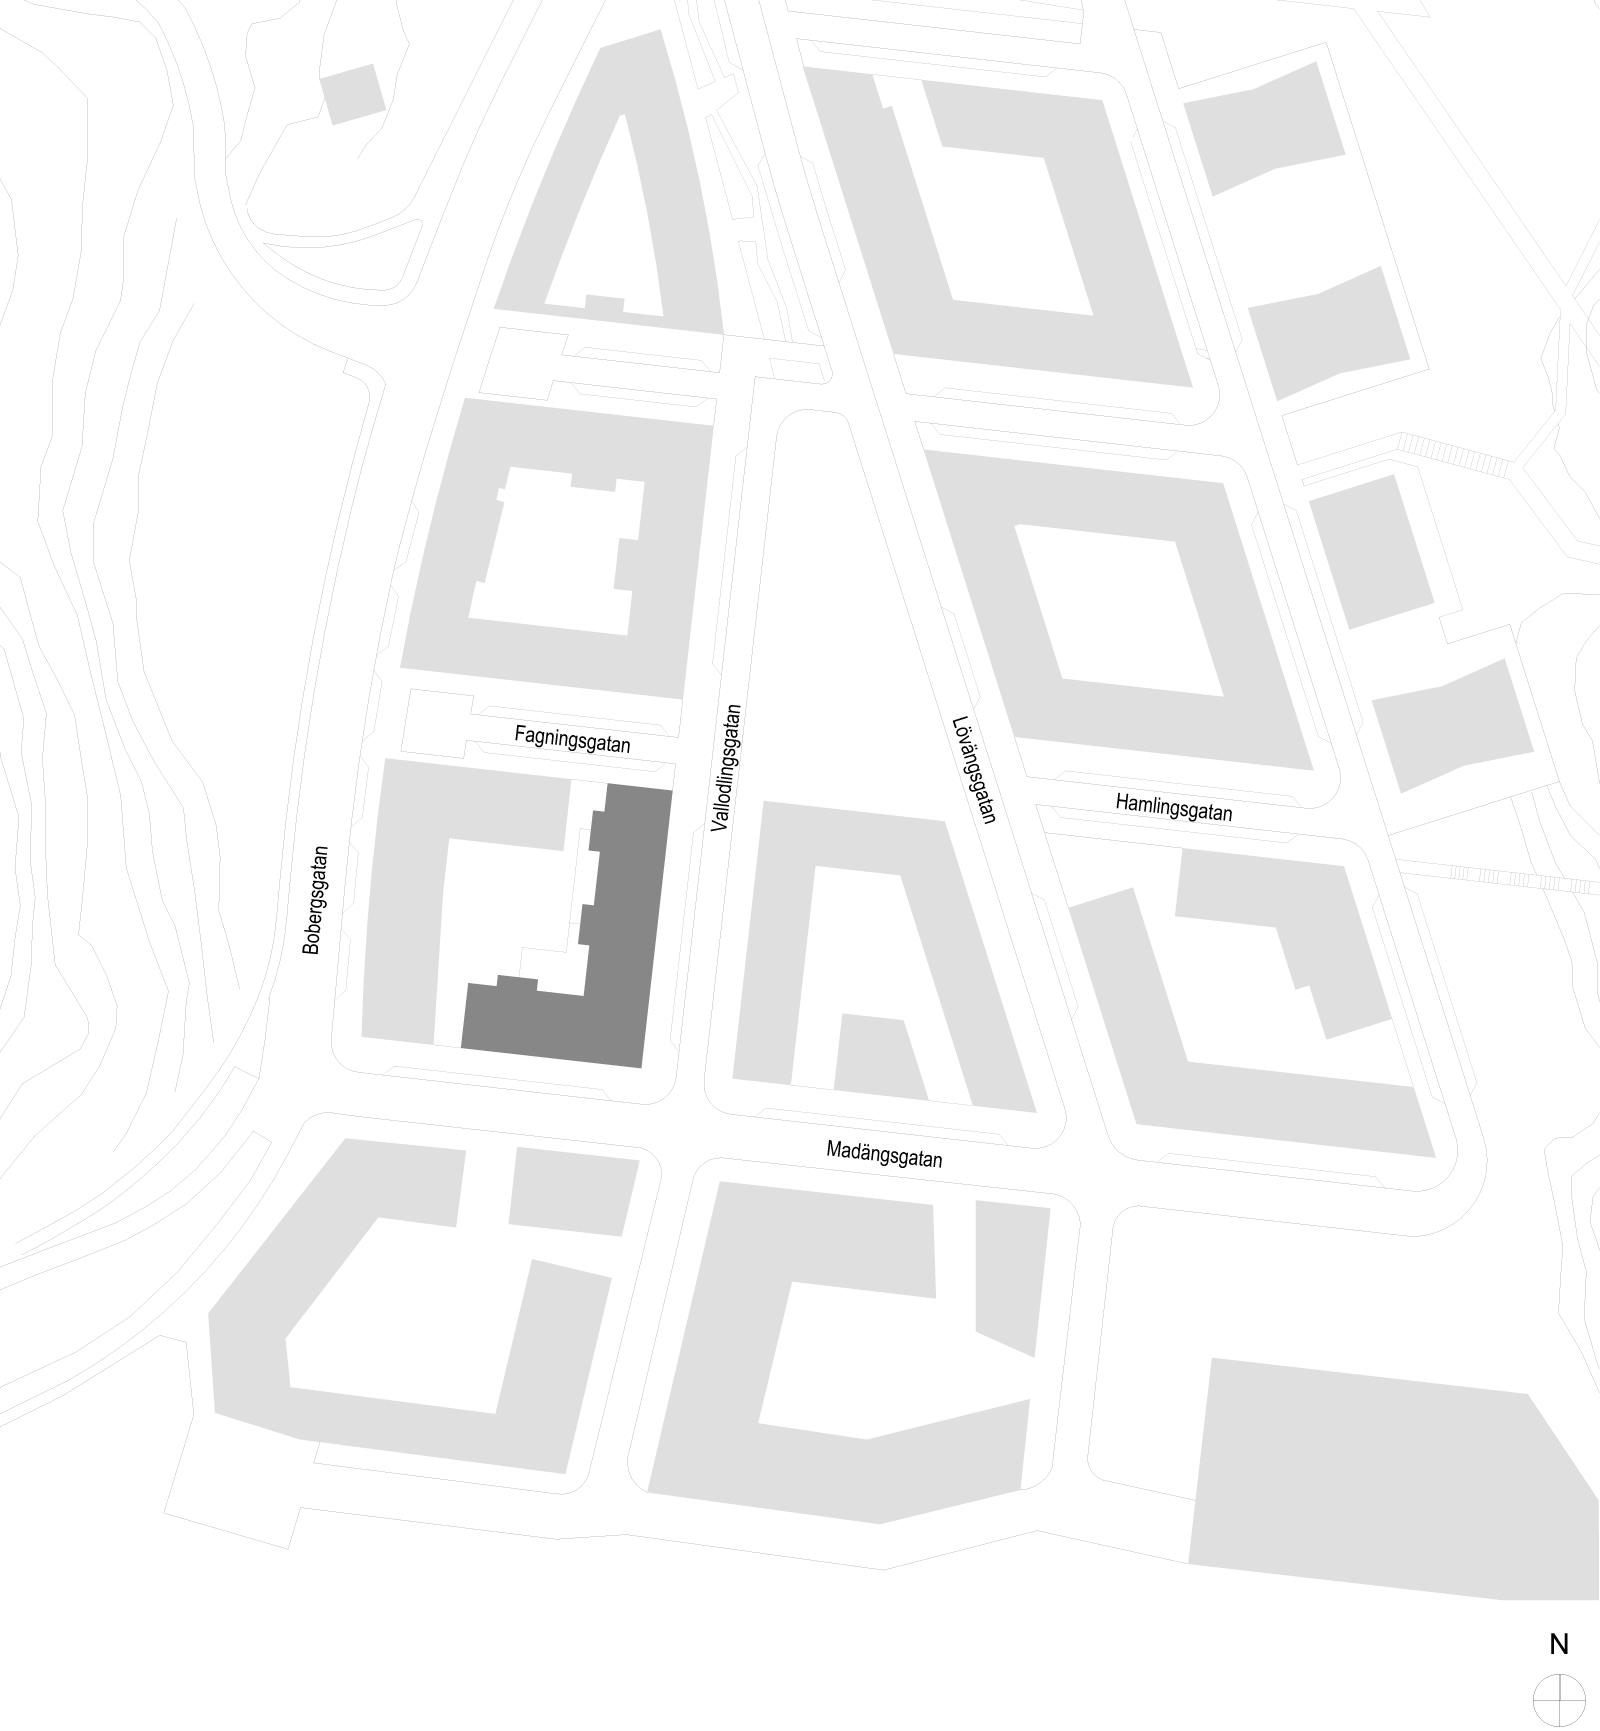 farnebofjardensituationsplan.jpg